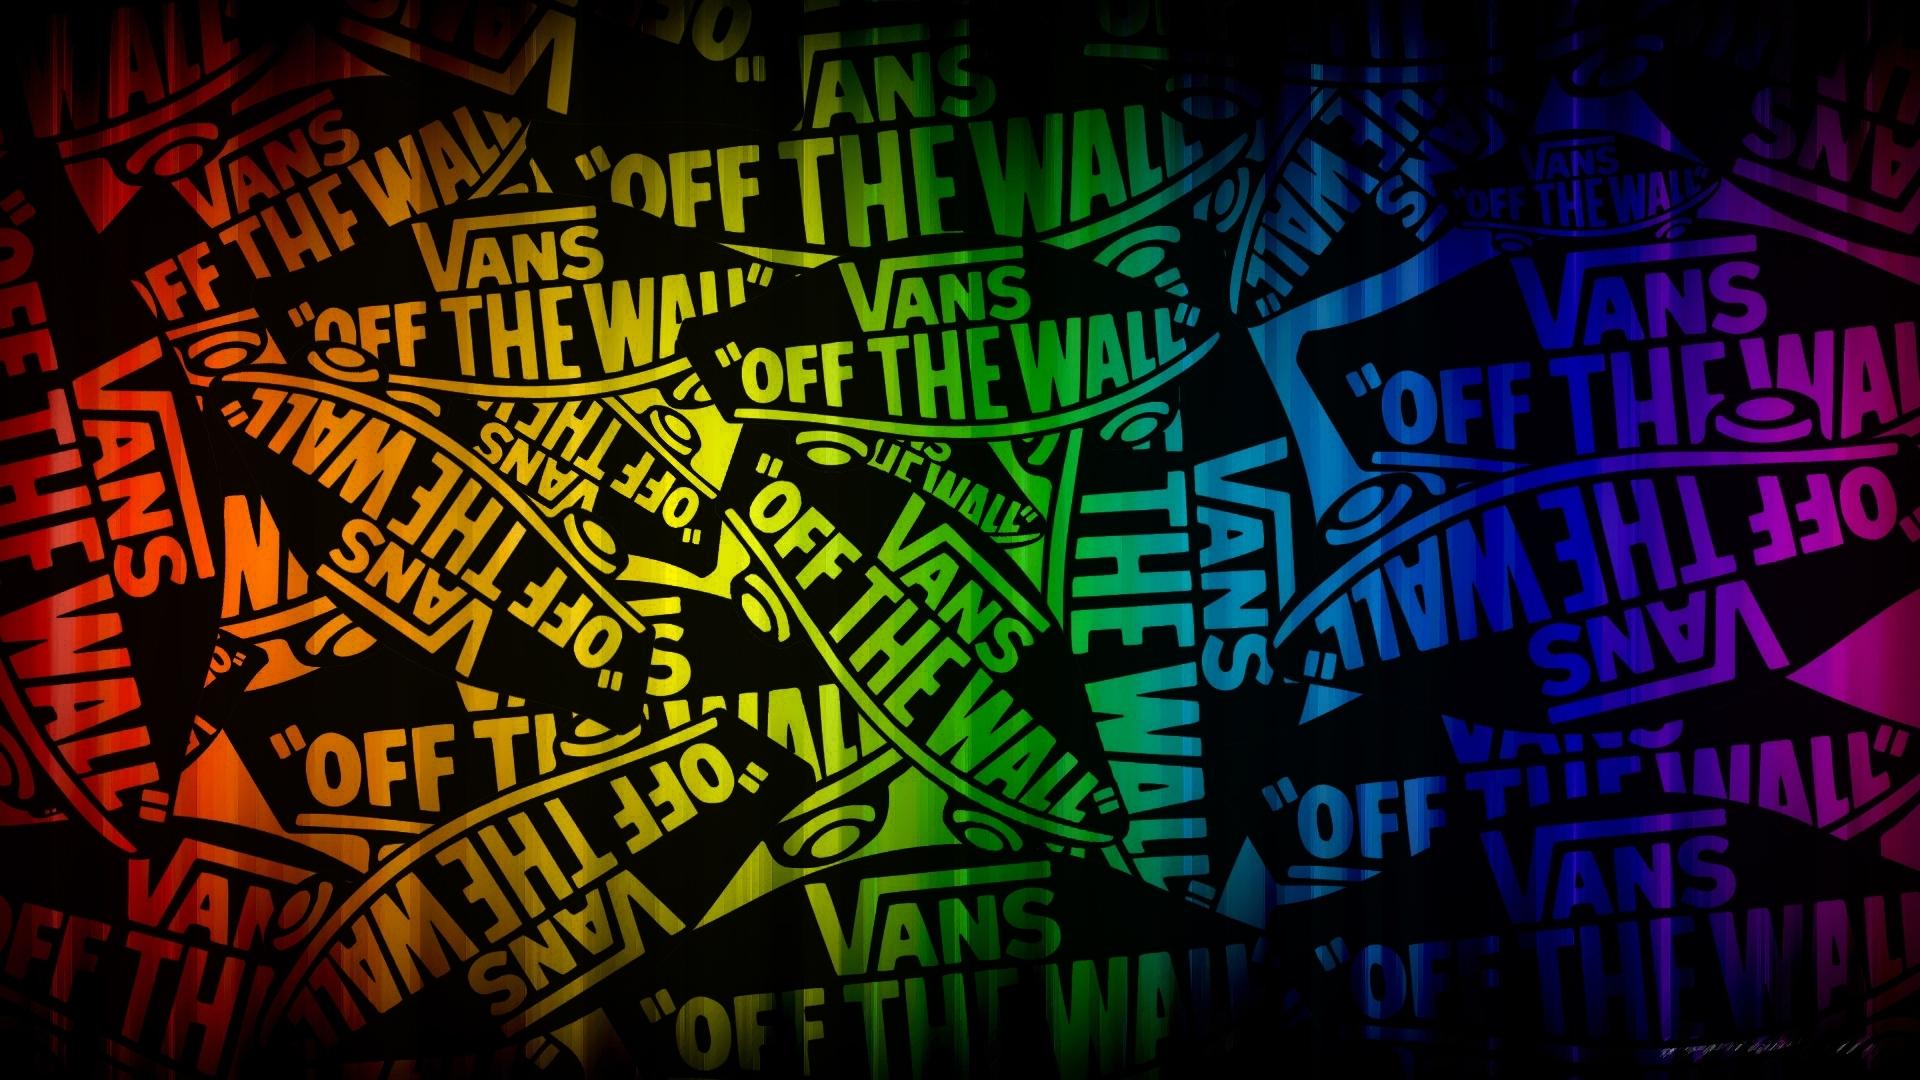 cool vans wallpapers wallpapersafari off the wallceejaydejesus